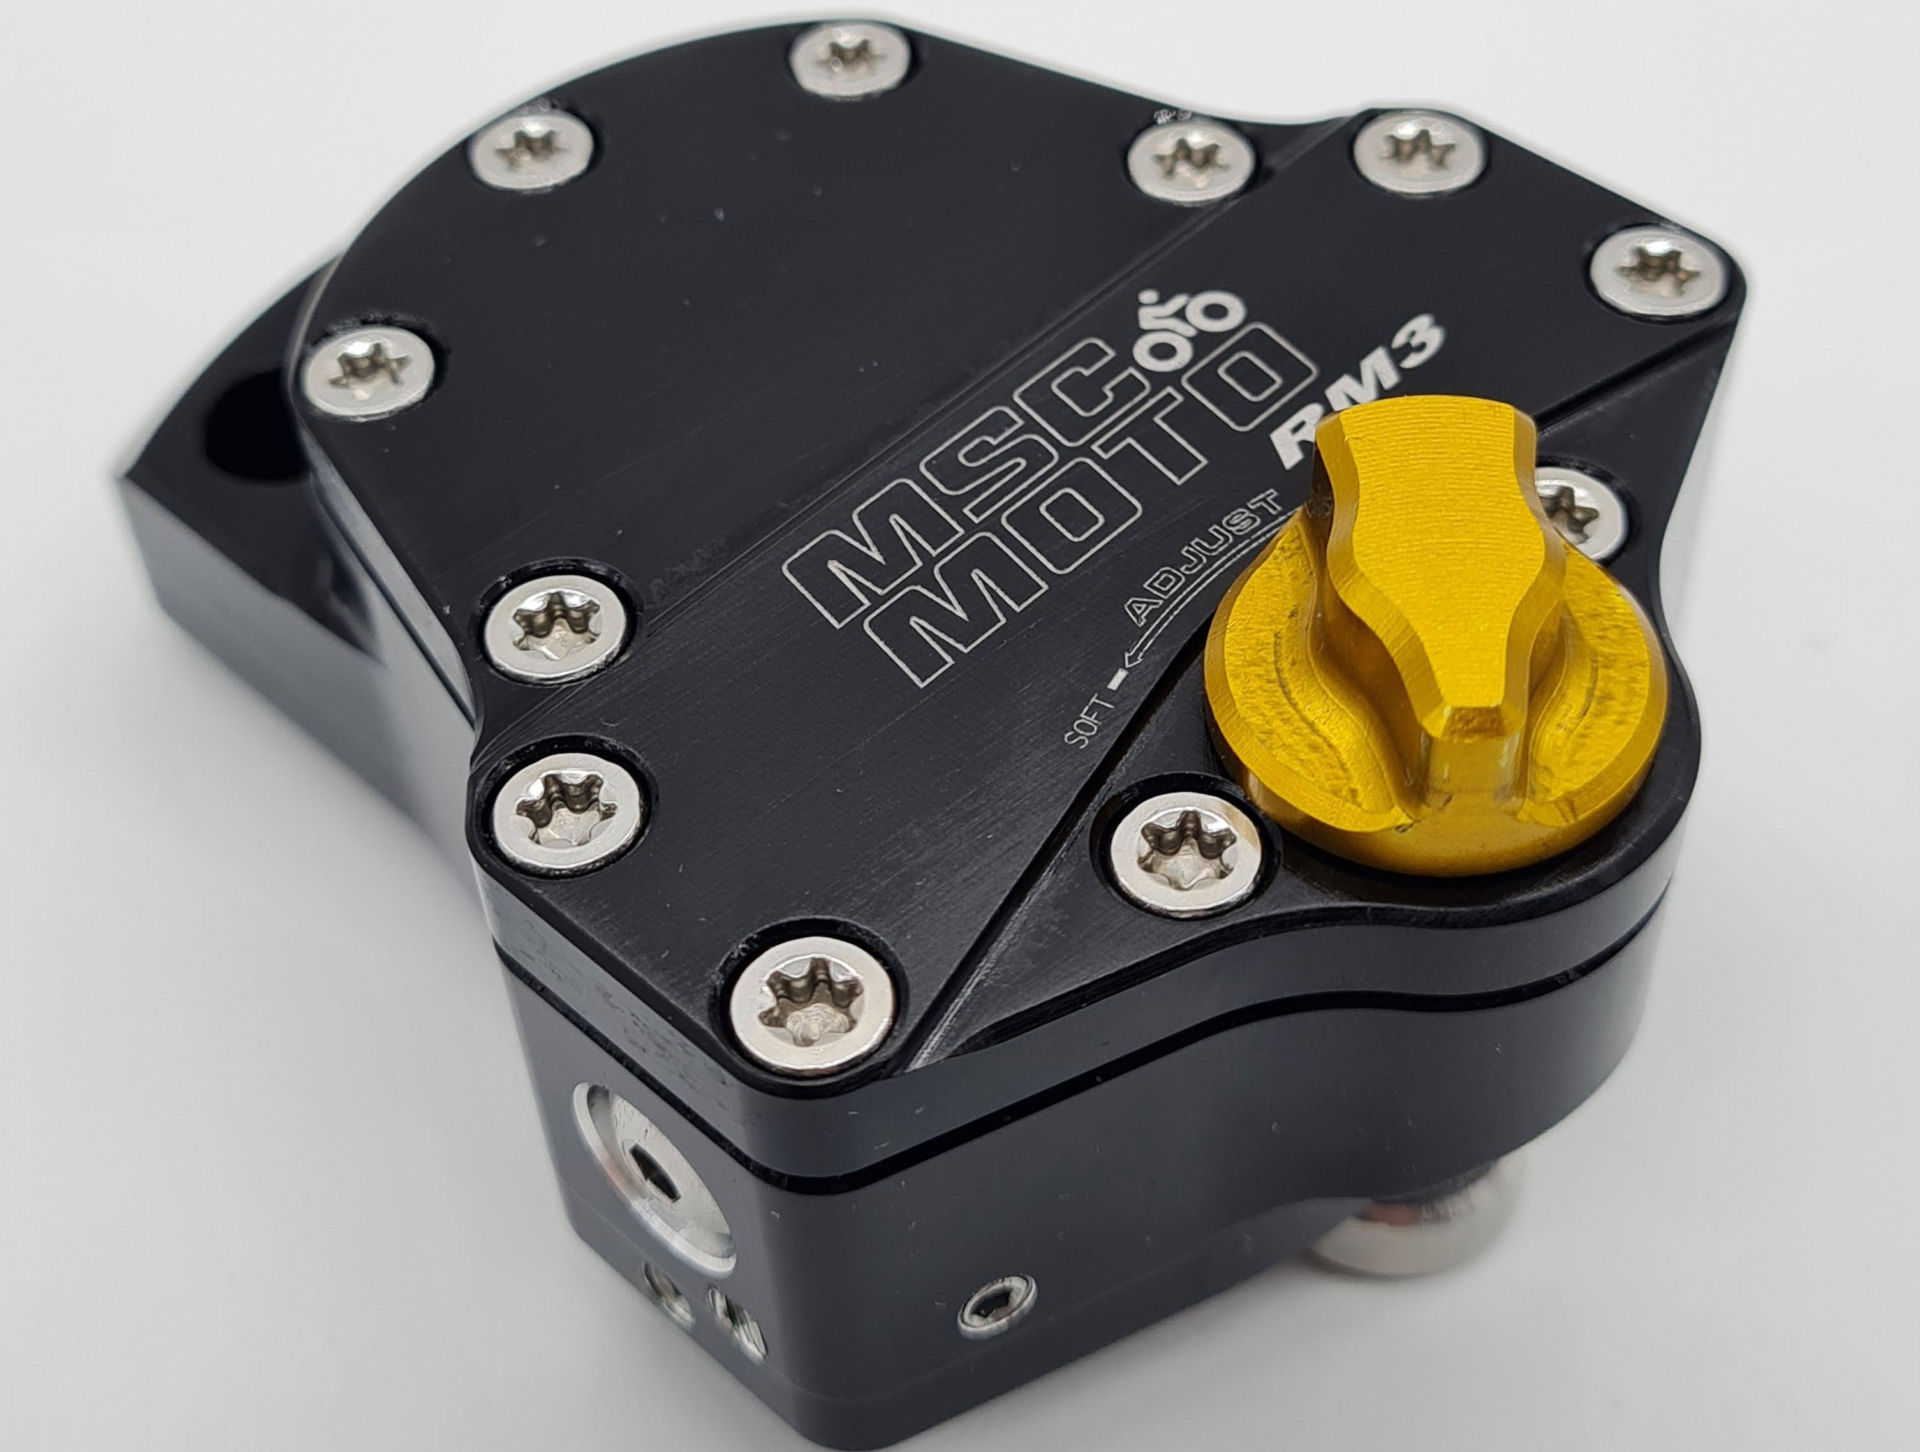 A MSC Moto steering damper. Photo courtesy Lindeco Genuine Powersports.